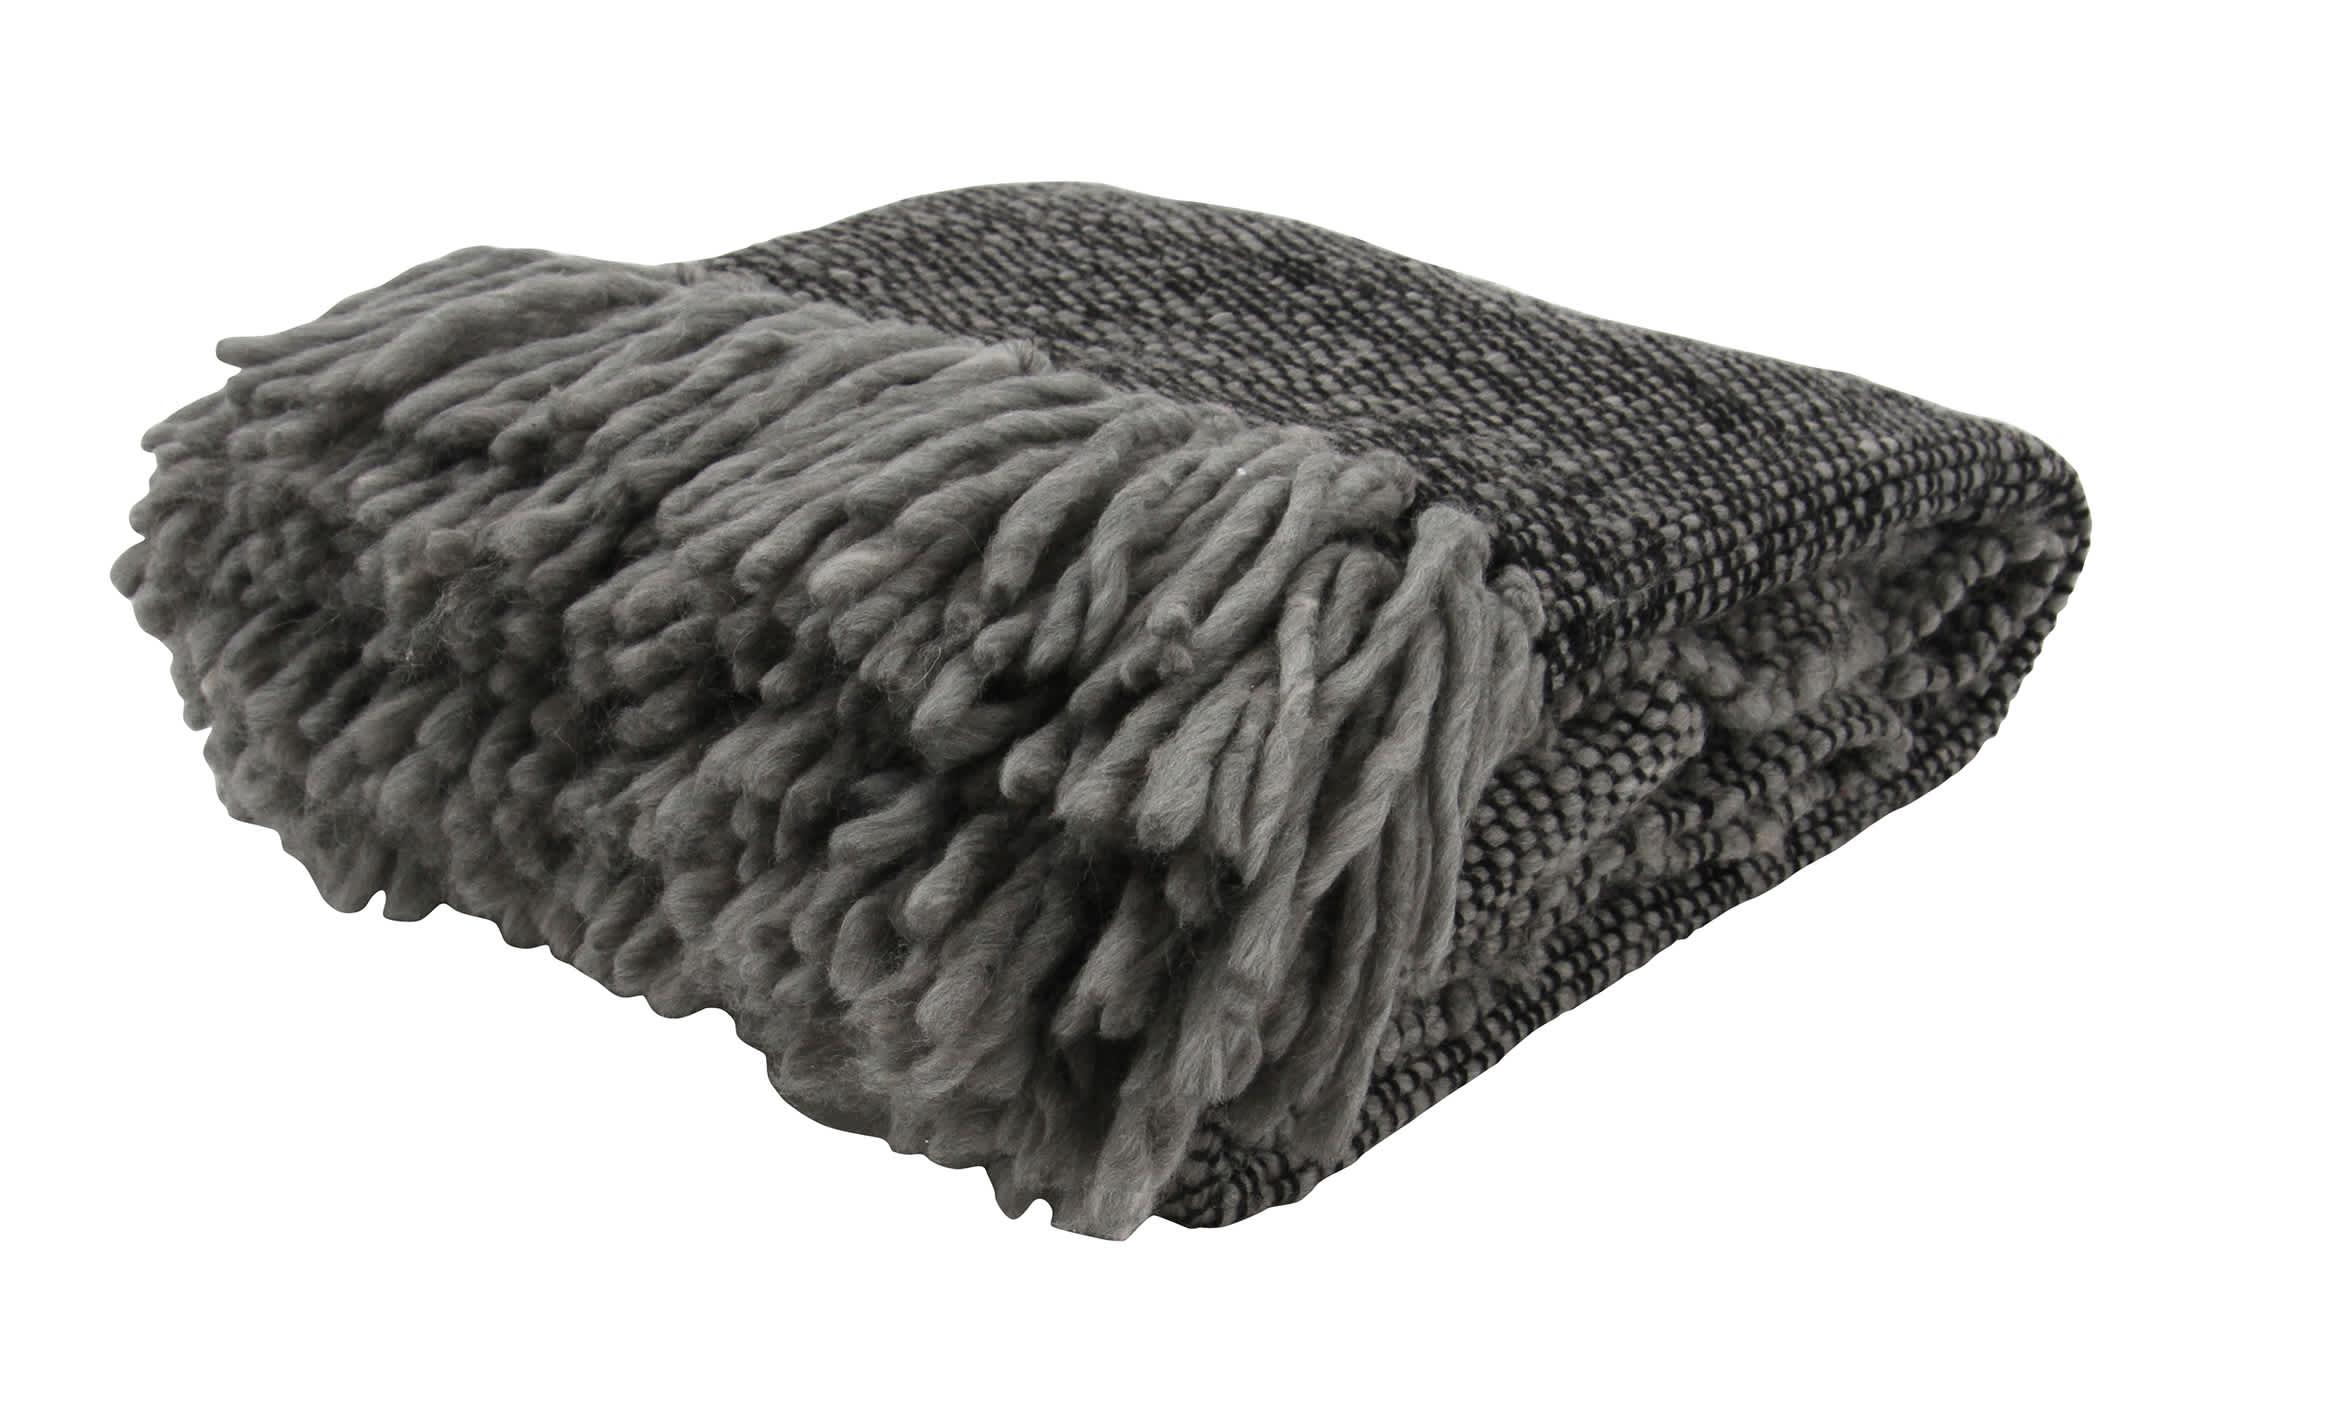 Wallace Cotton Aoraki Wool Blanket